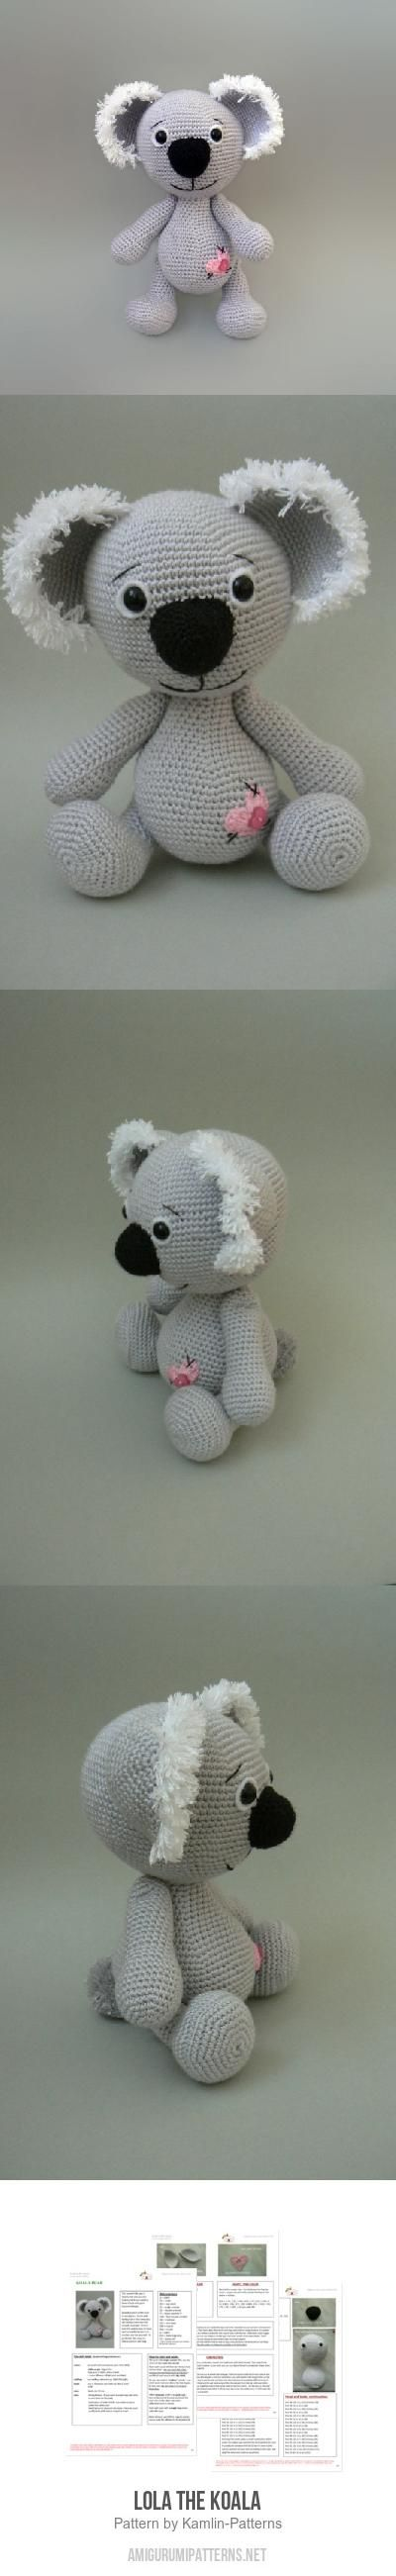 Lola the Koala amigurumi pattern by Kamlin Patterns   Pinterest ...